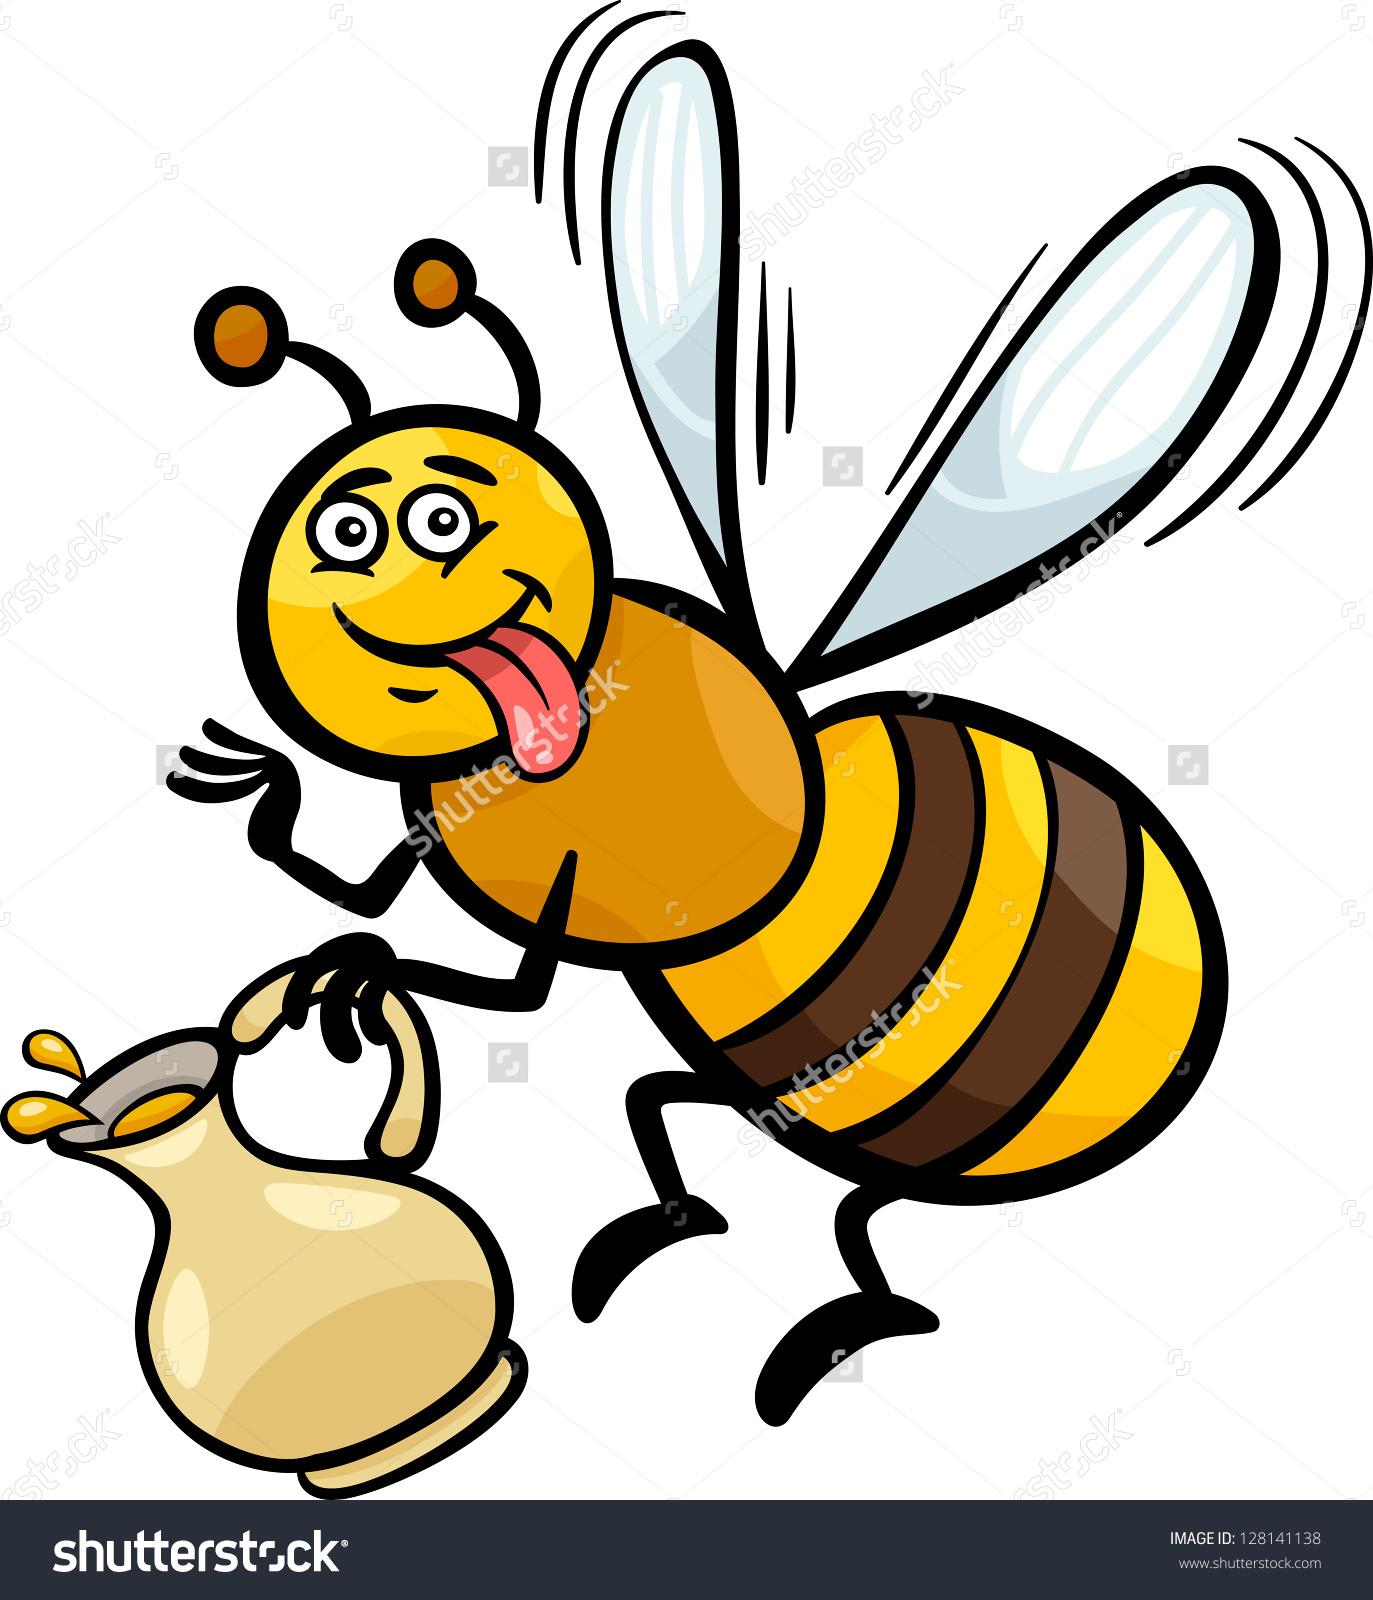 1373x1600 Honey Bee Drawing Cartoon Honey Bee Drawing Cartoon Cartoon